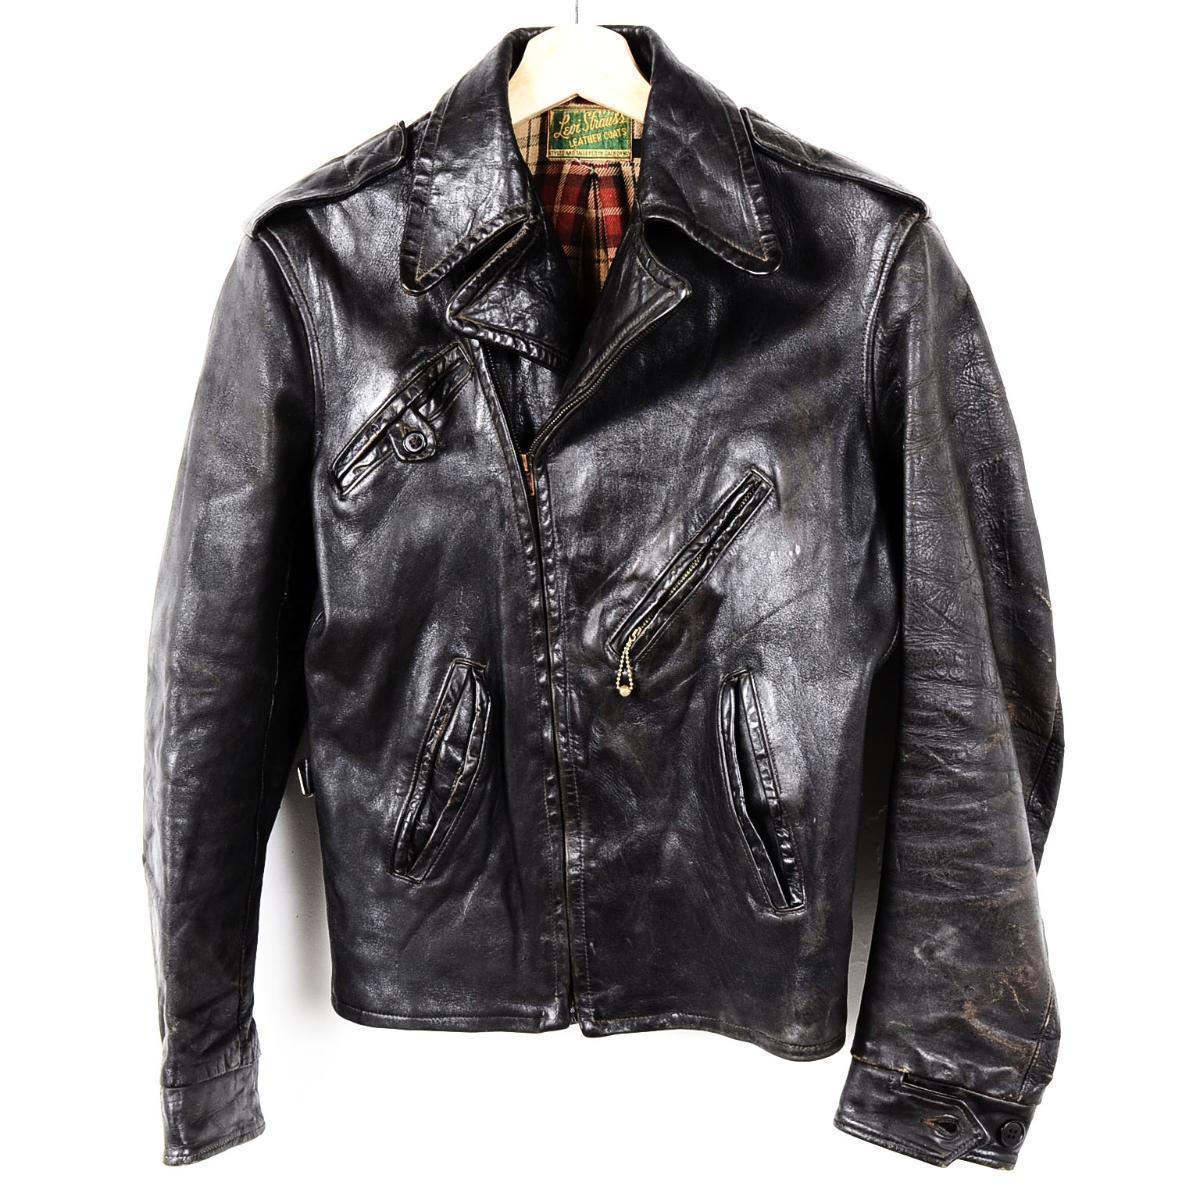 a2975facd 30s - Levis Levi's LEVI STRAUSS LEATHER COATS leather sports jacket men S  vintage /weu0179